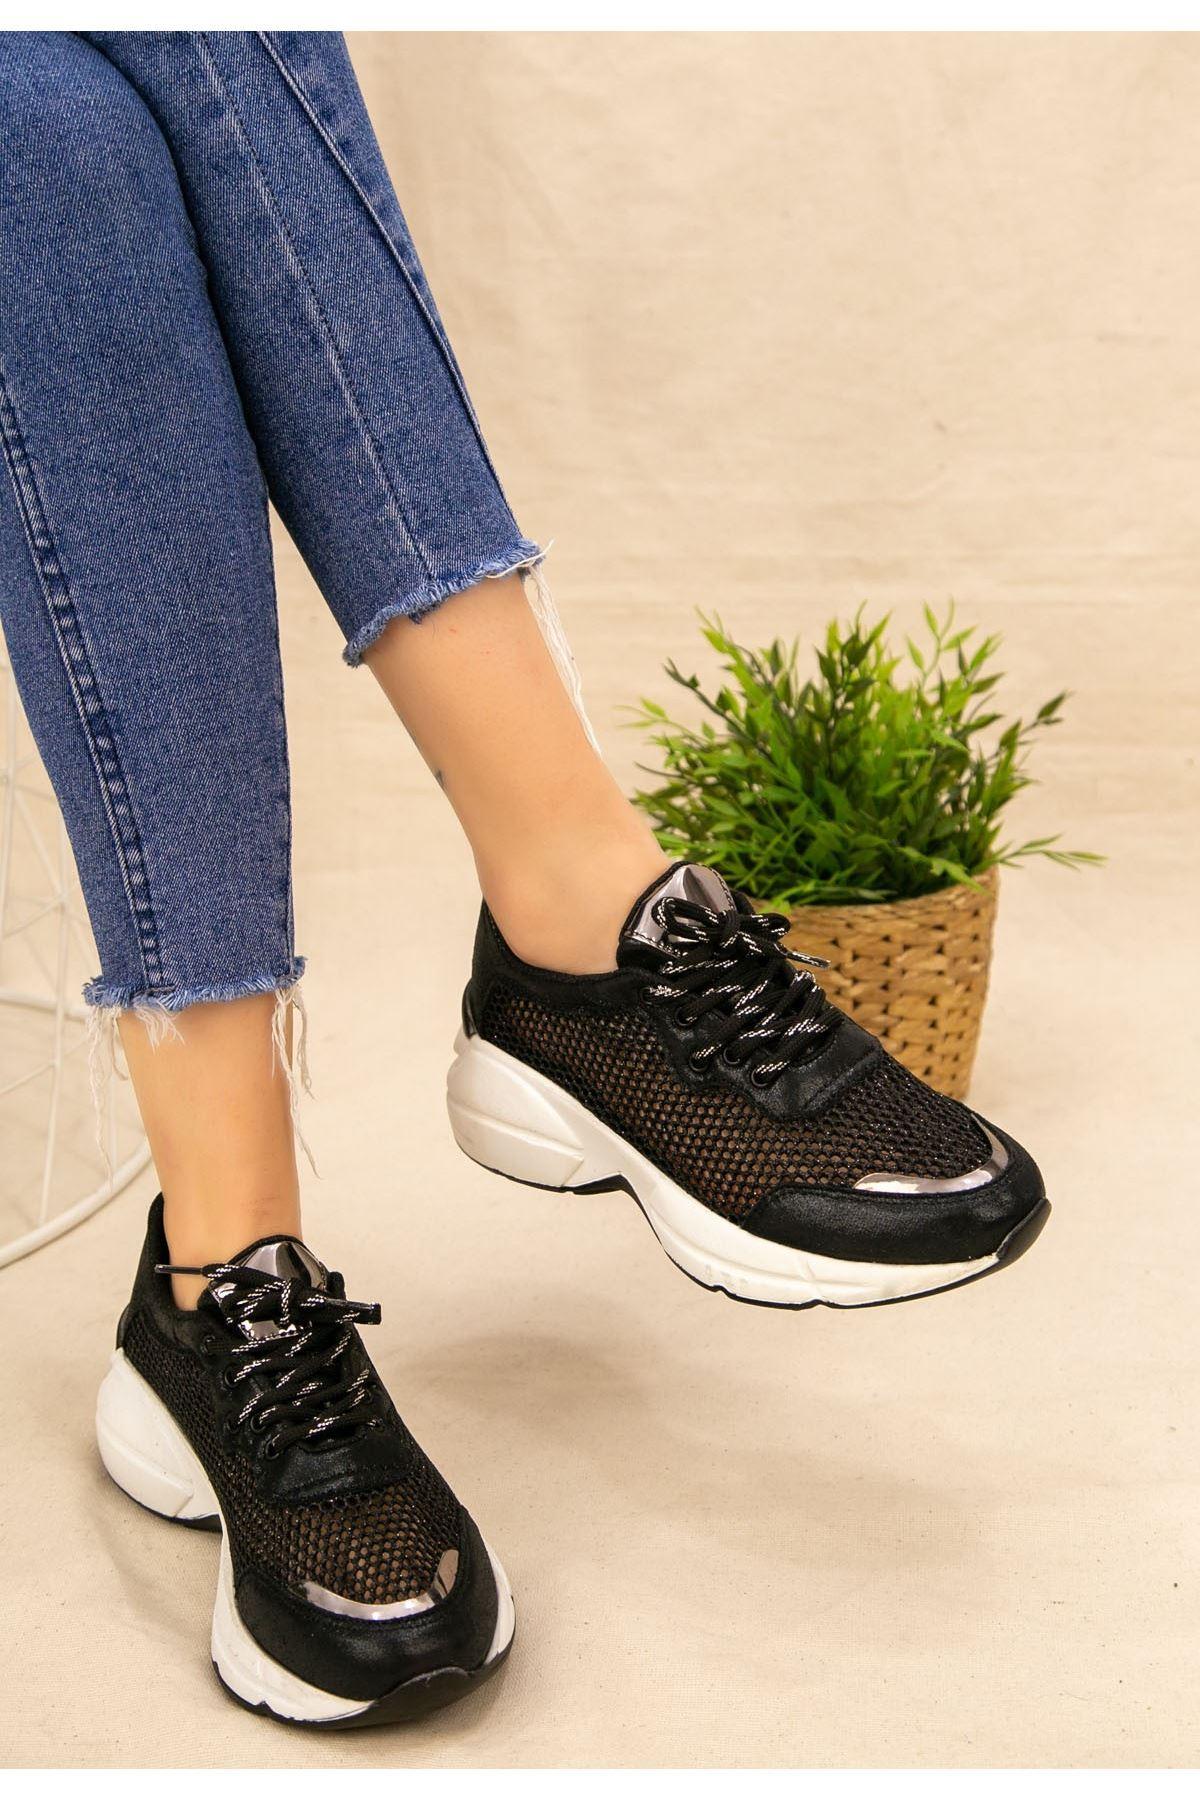 Miss Siyah Cilt Fileli Spor Ayakkabı